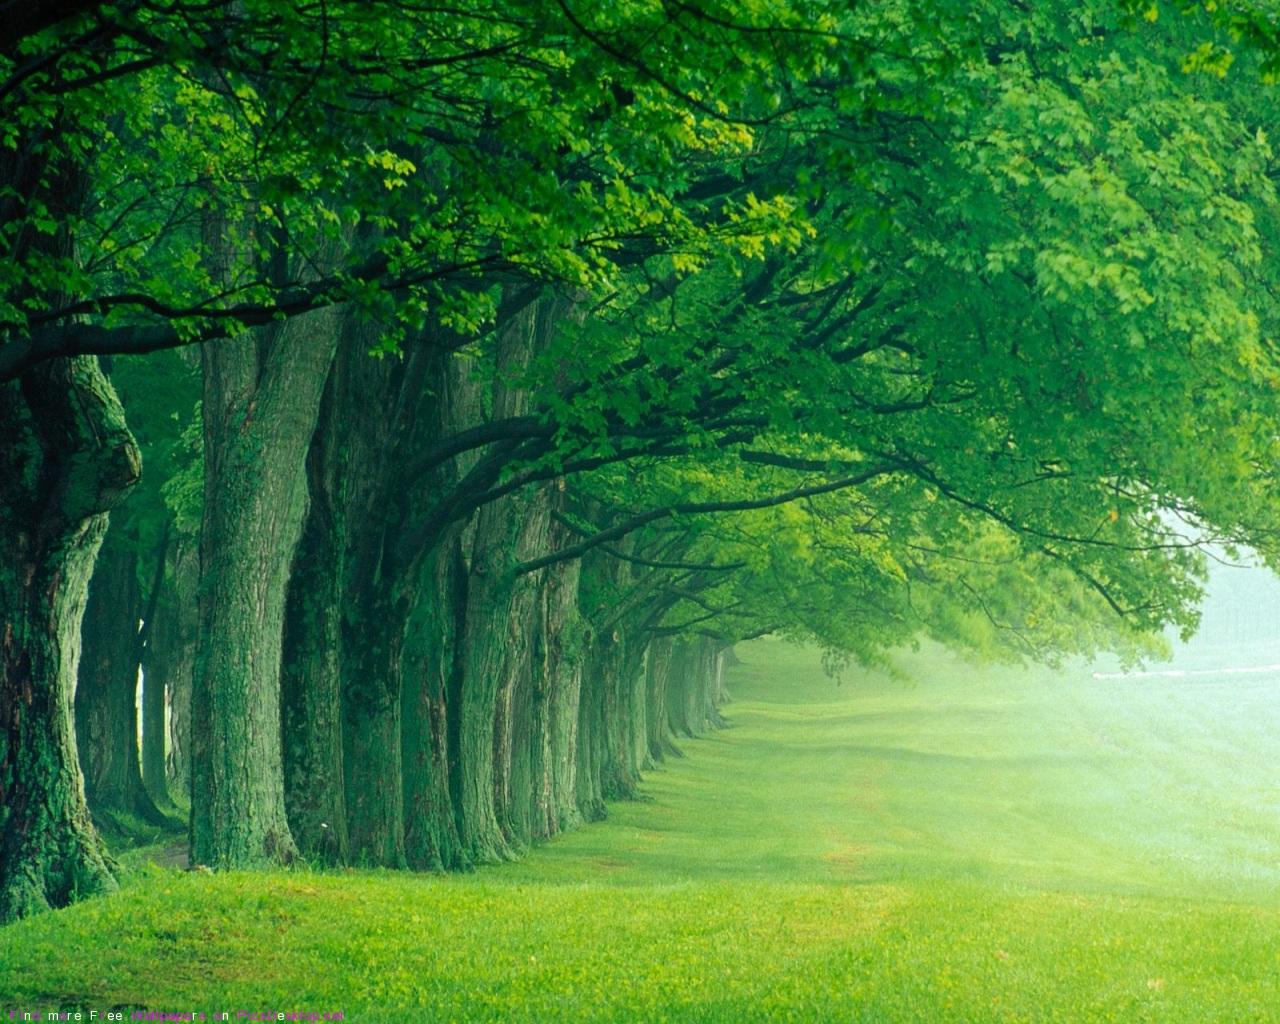 Green Forest - Nature Photo (36241521) - Fanpop